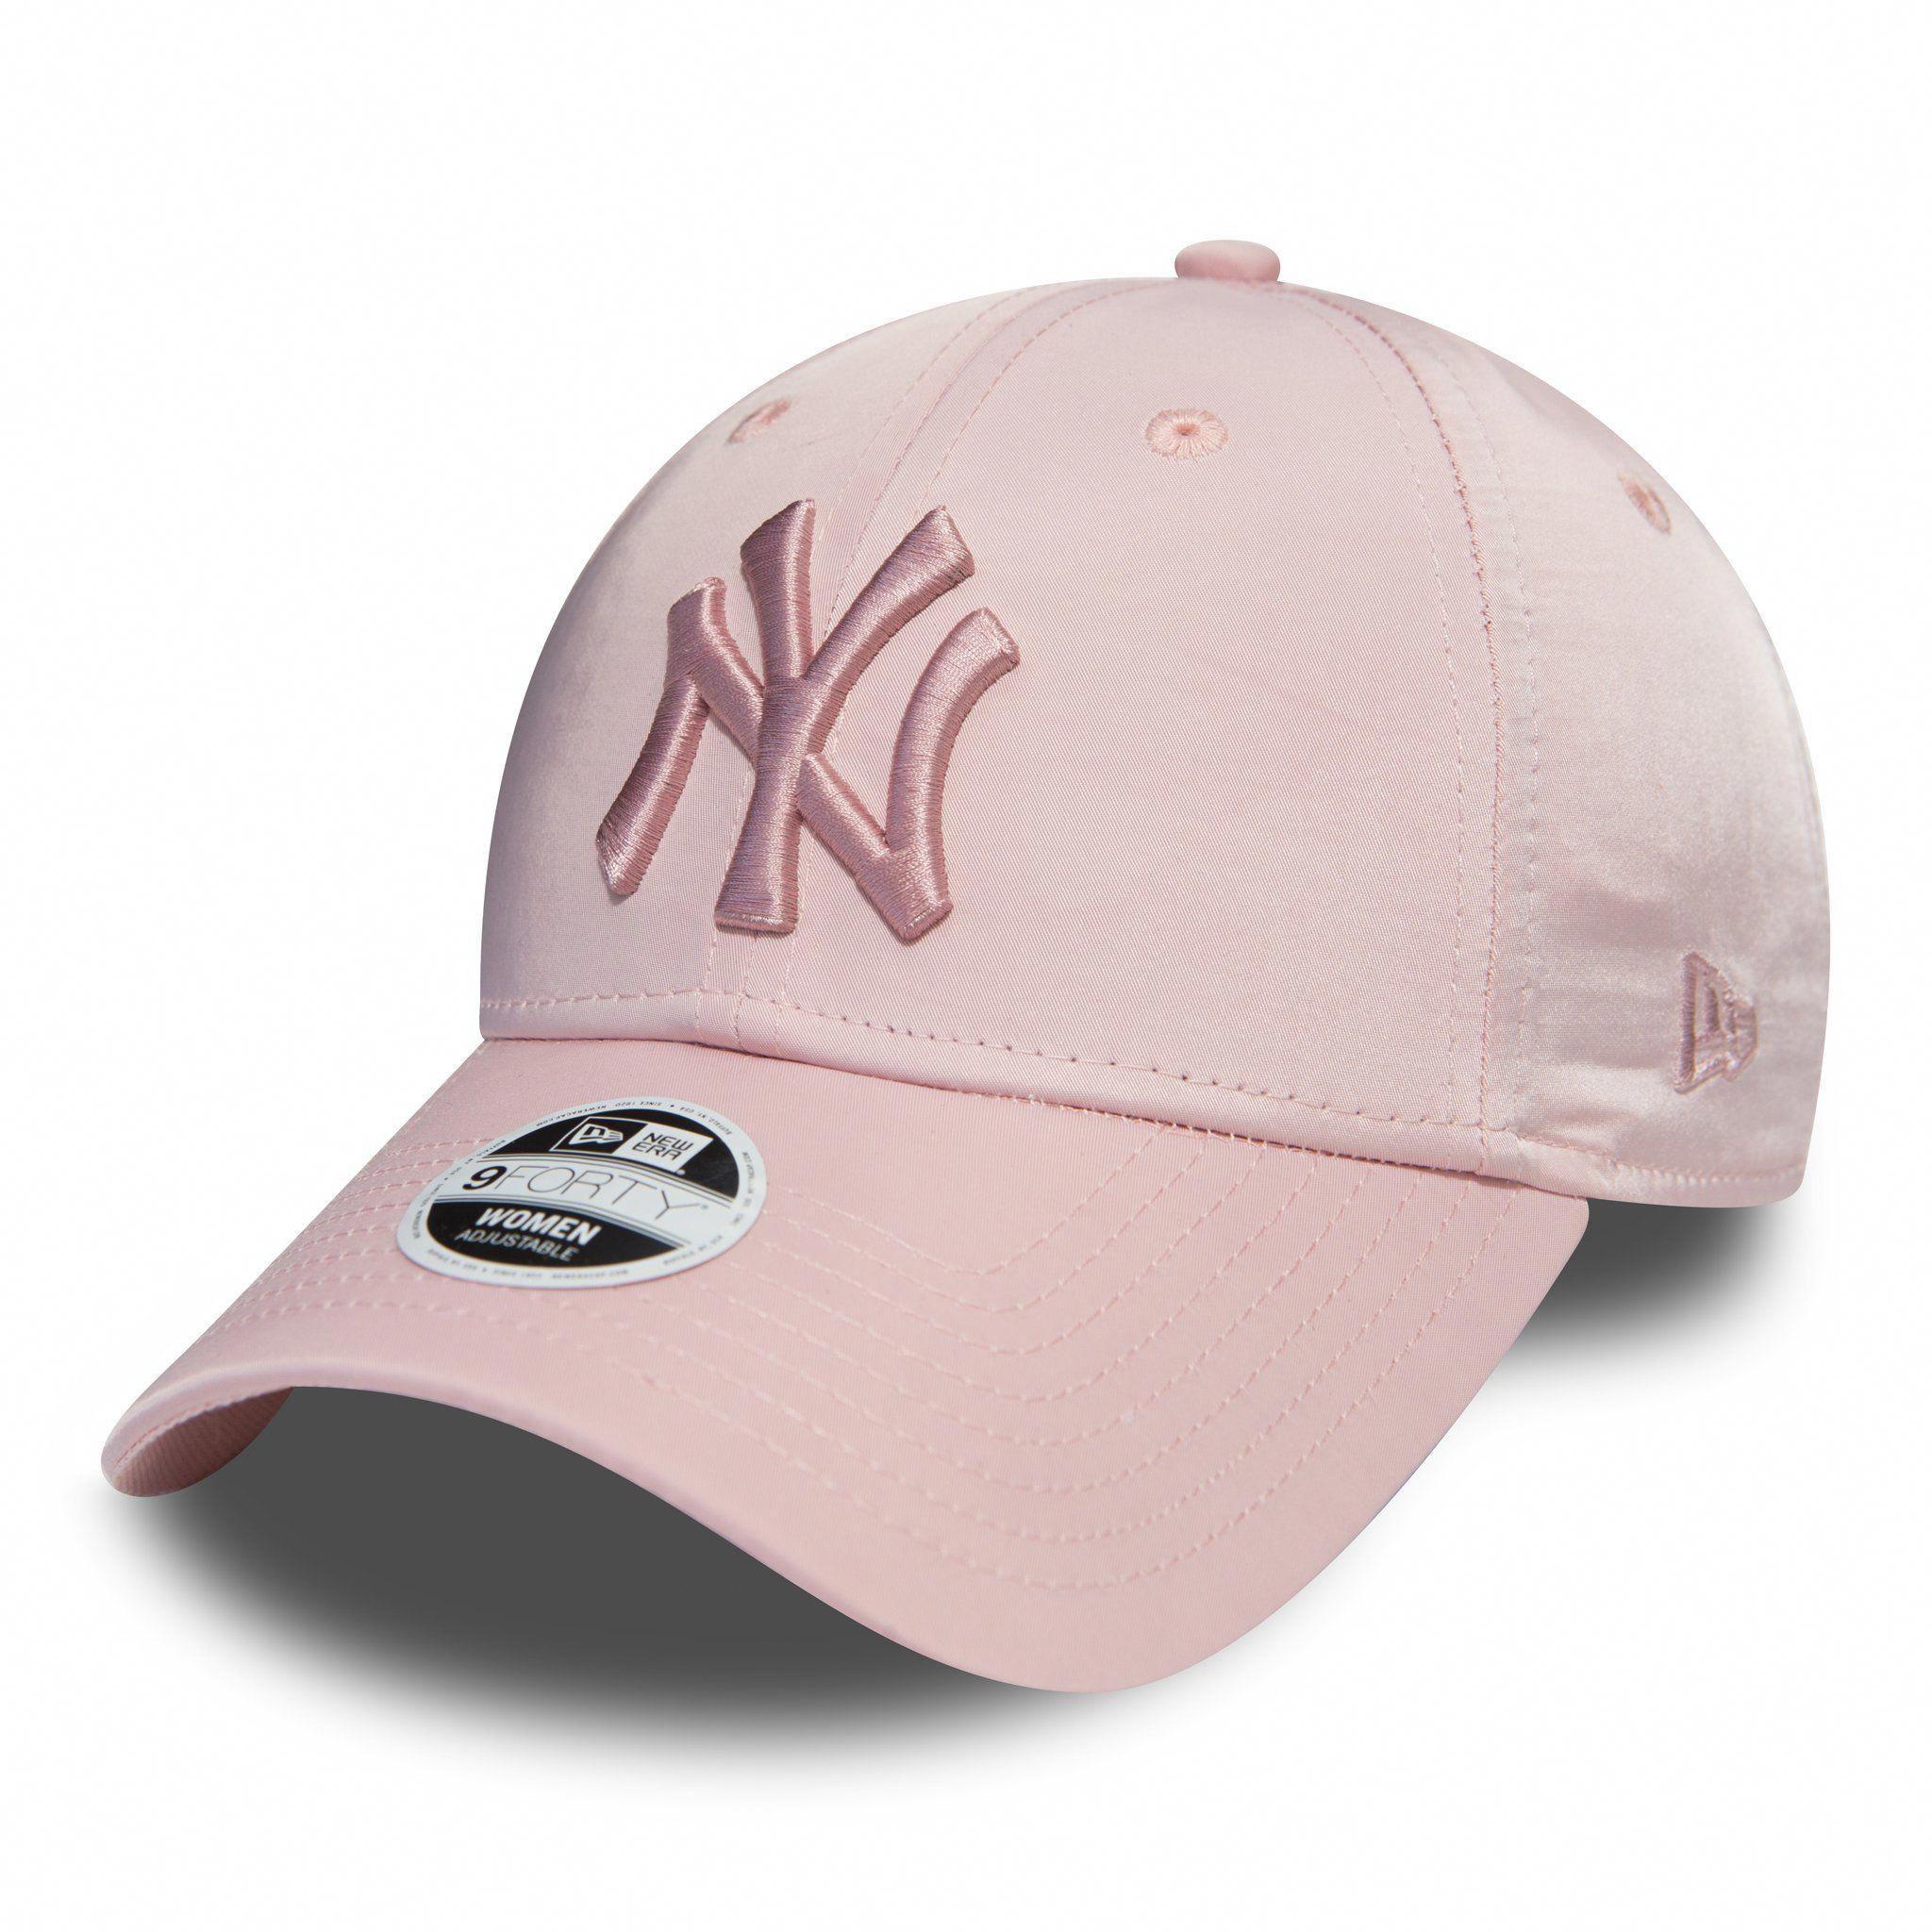 1aec6819054a7 NY Yankees Womens New Era 940 Satin Pink Baseball Cap – lovemycap   baseballcaps